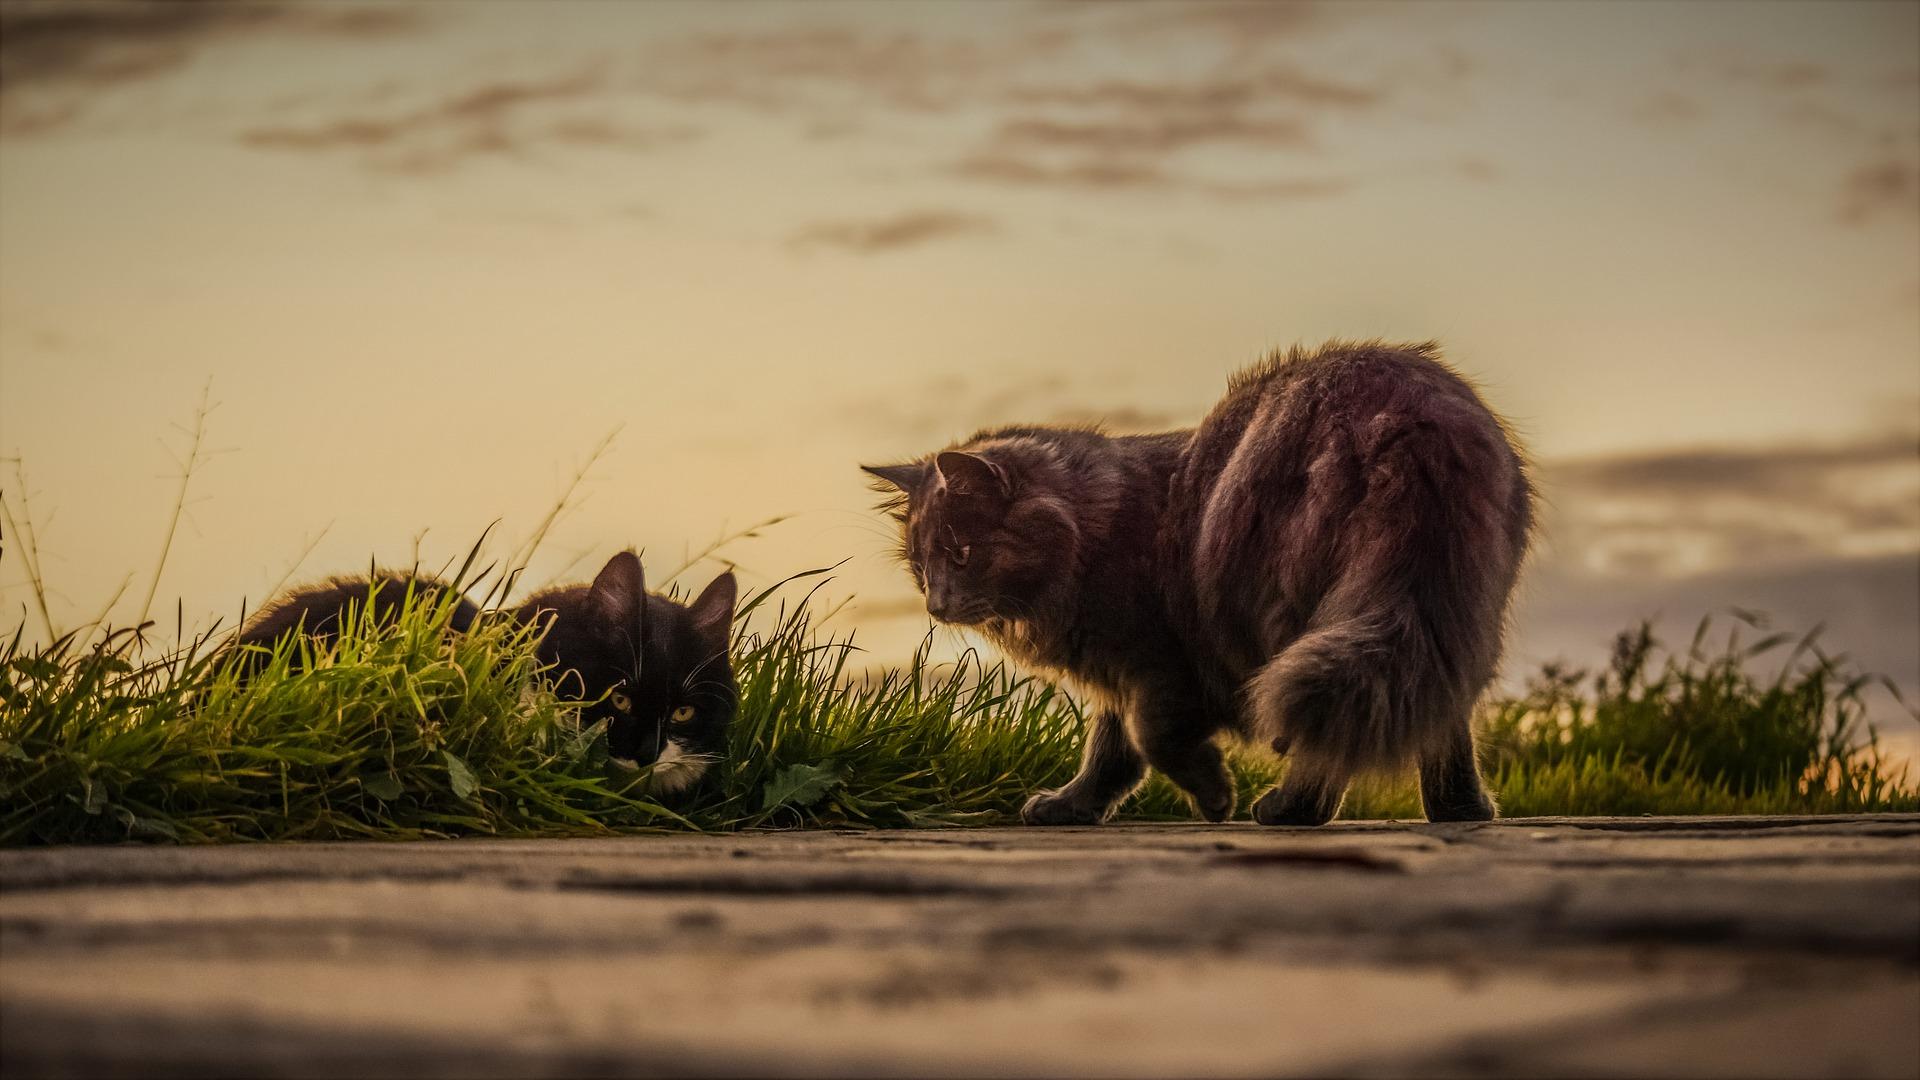 download wallpaper: katten langs de weg wallpaper